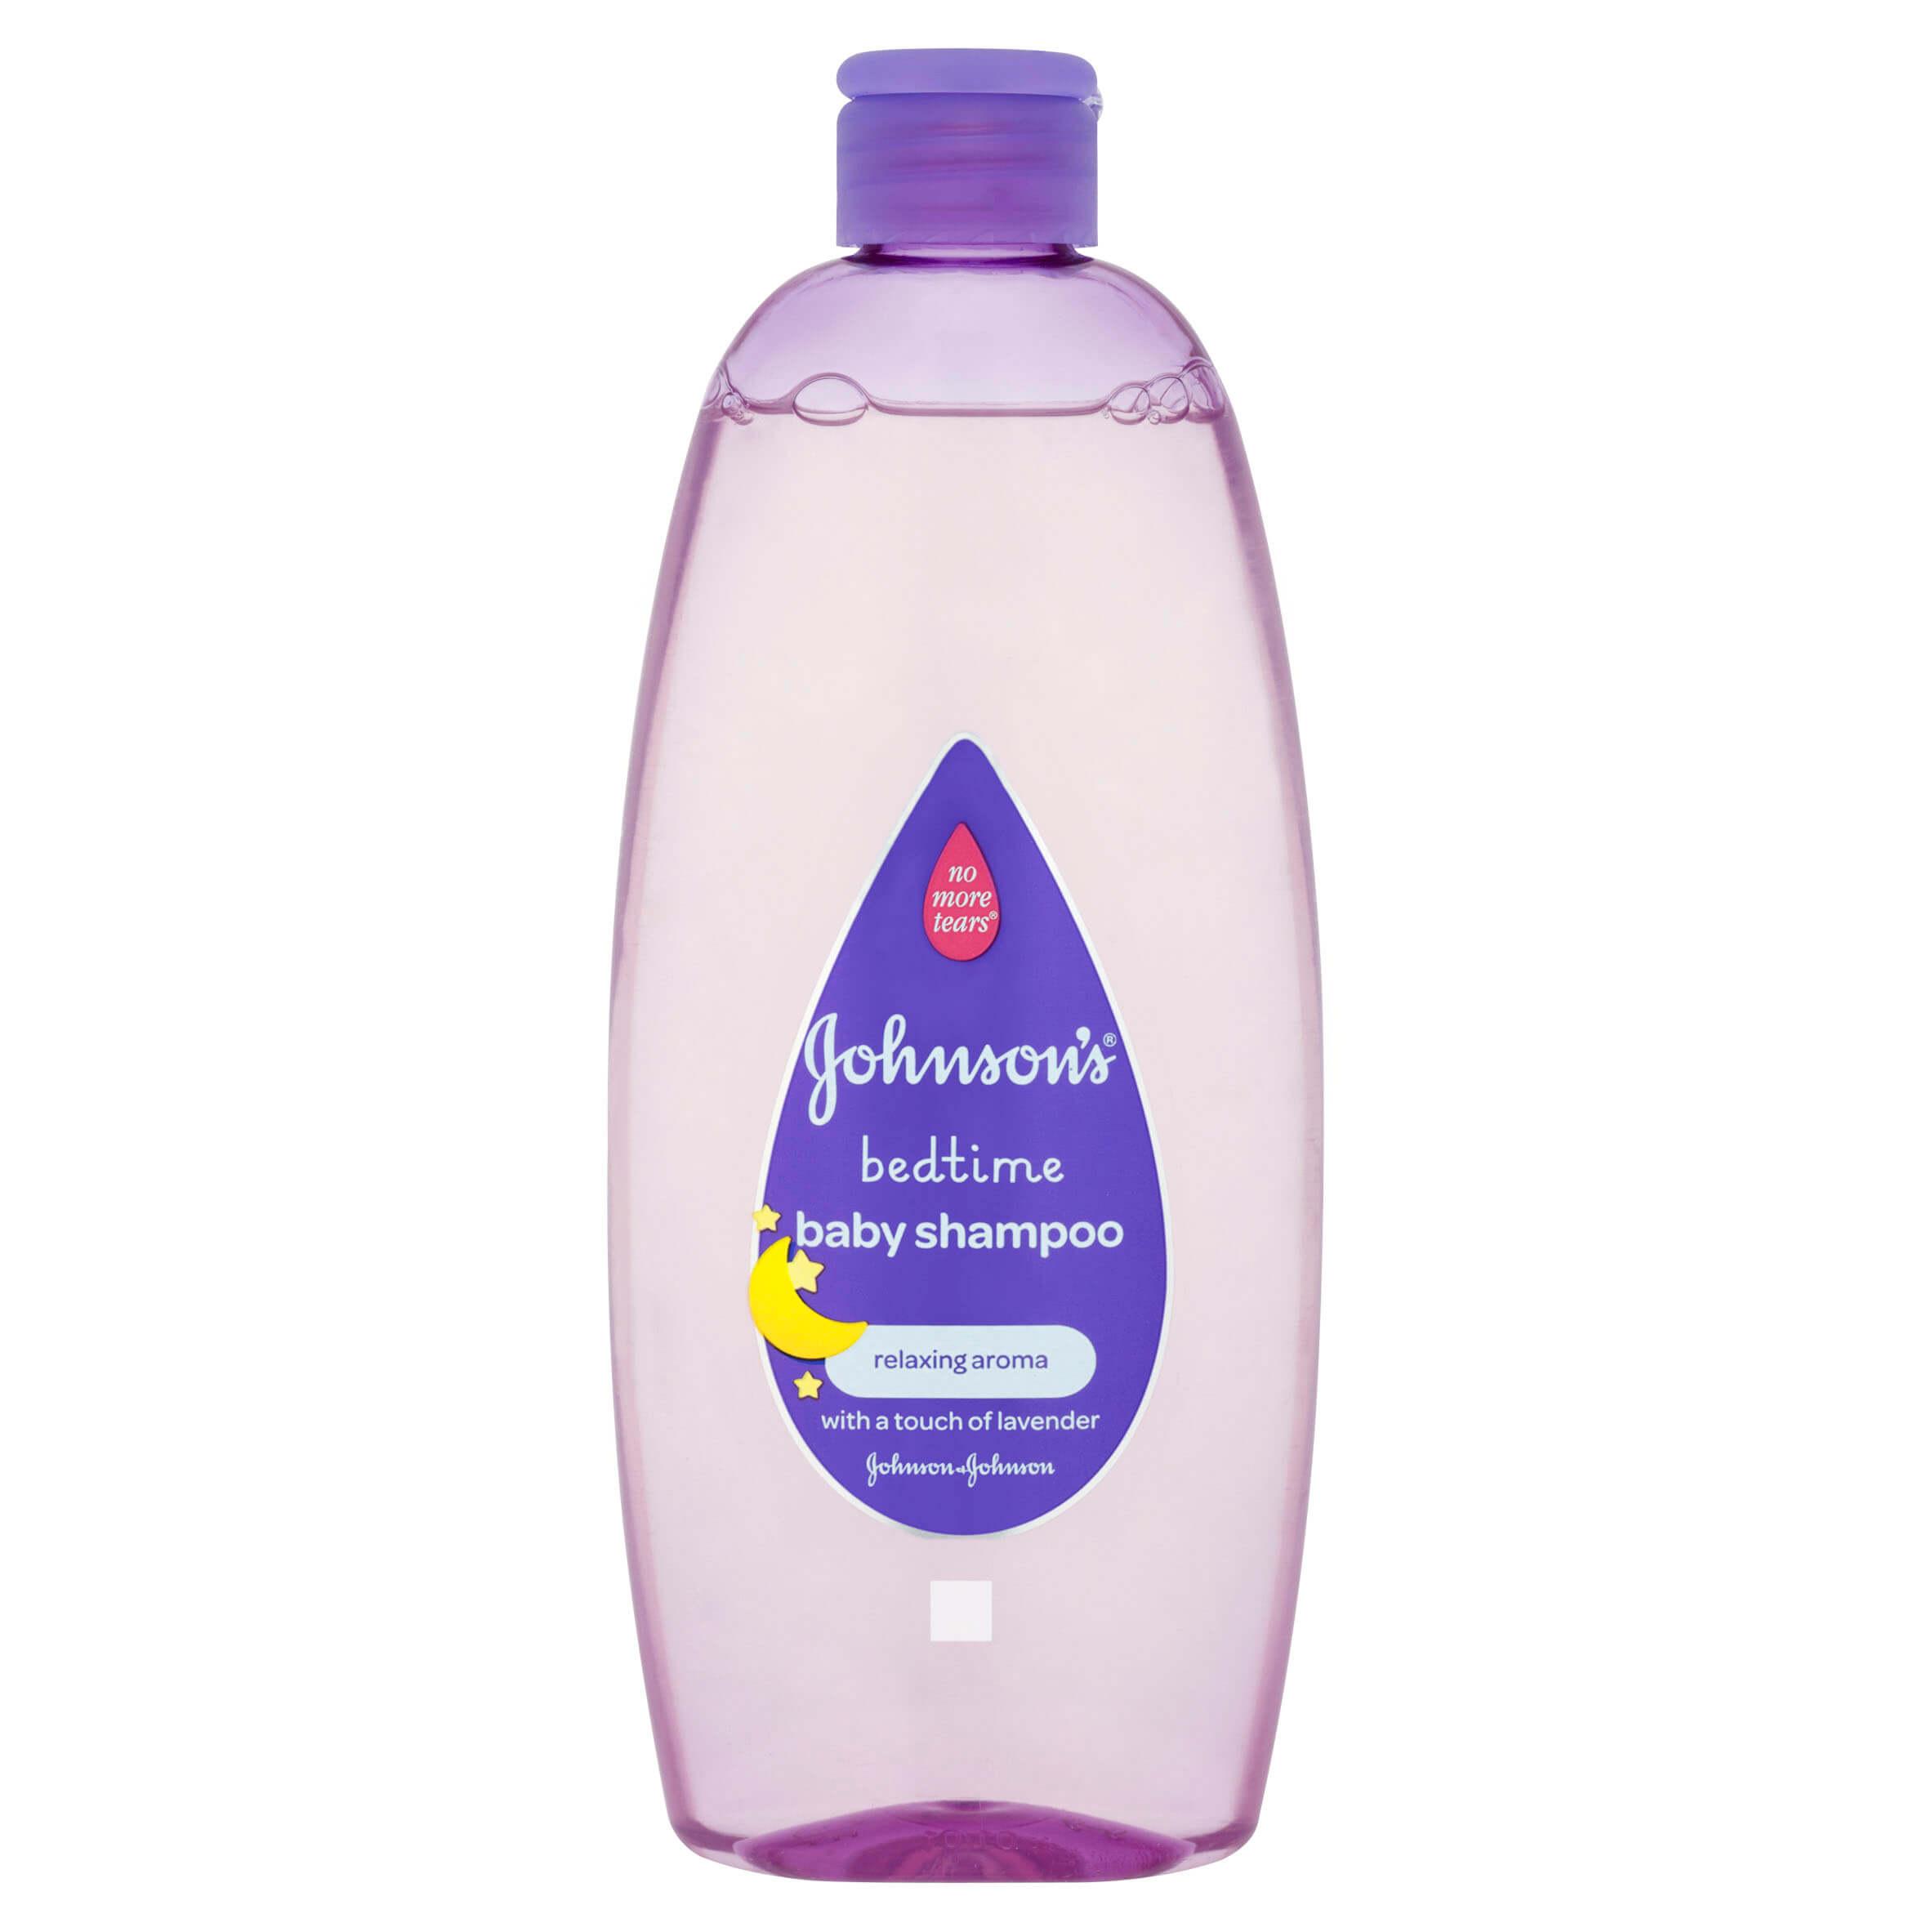 Toddler shampoo